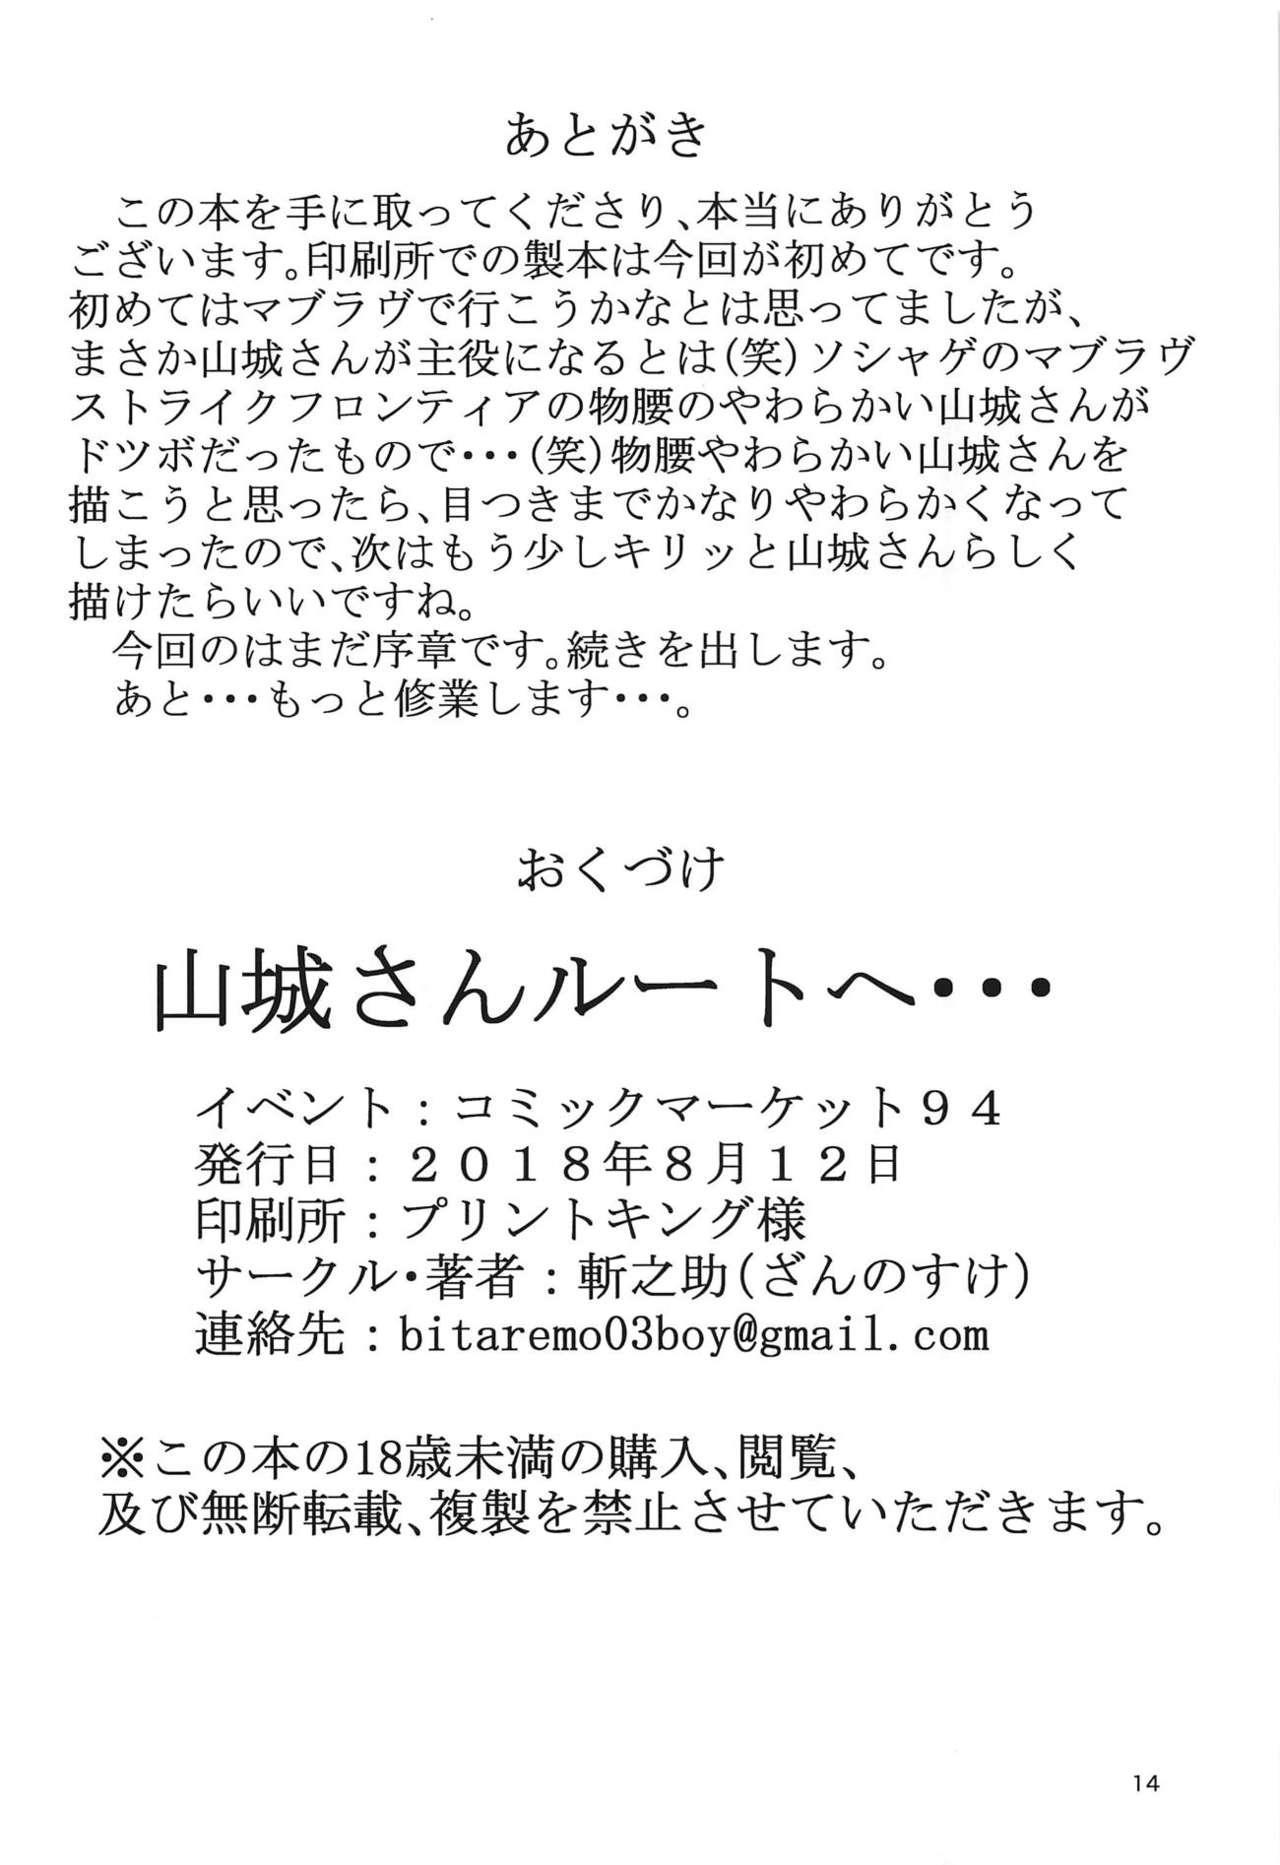 Yamashiro-san Route e... 12